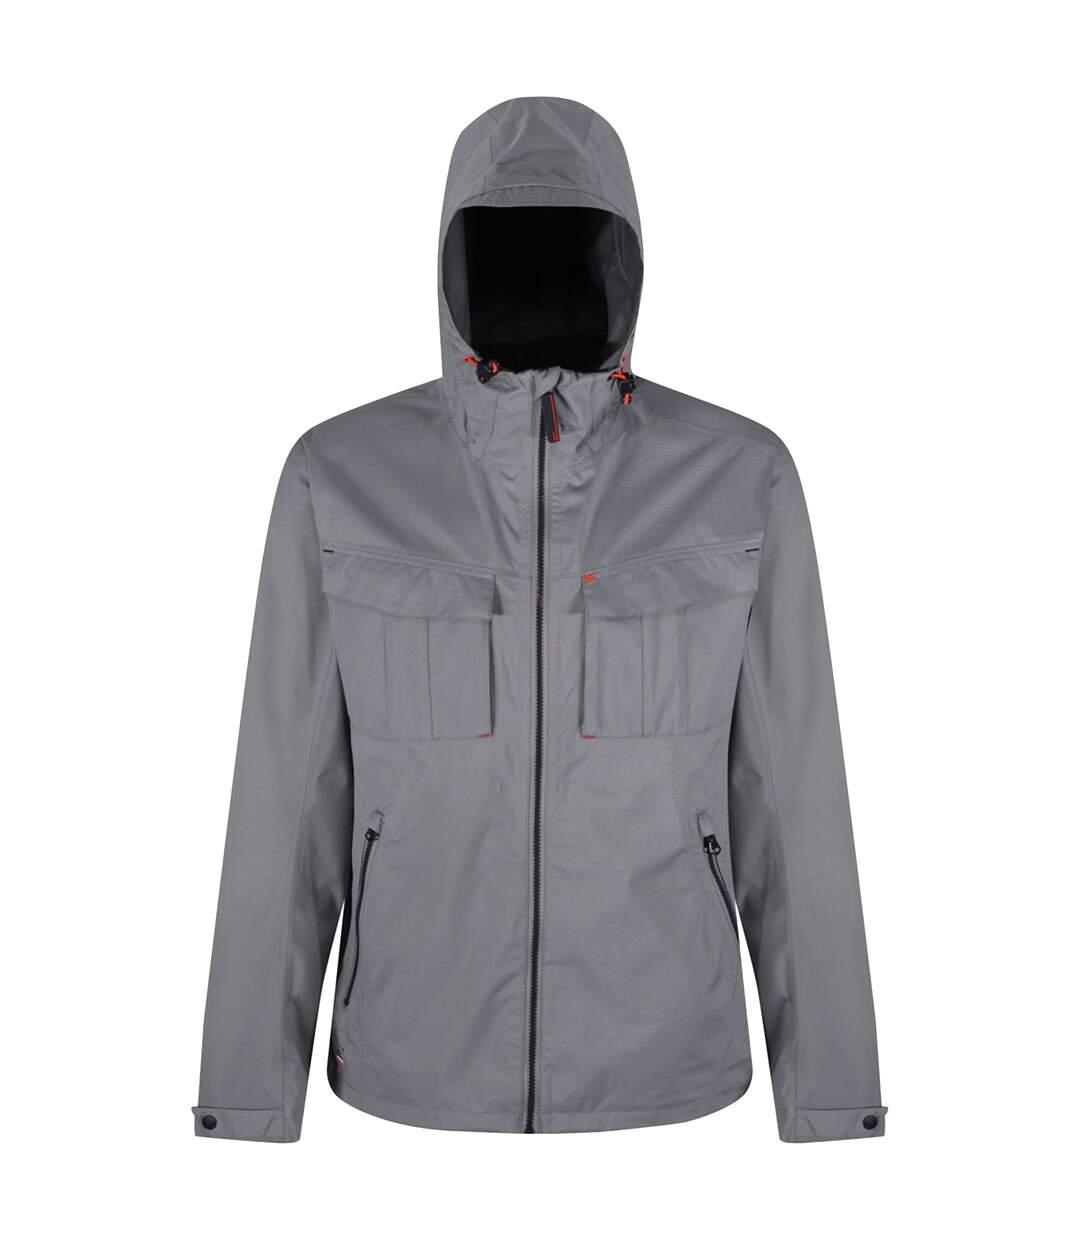 Regatta Great Outdoors Mens Bardolf Stretch Waterproof Jacket (Rock Grey) - UTRG3229